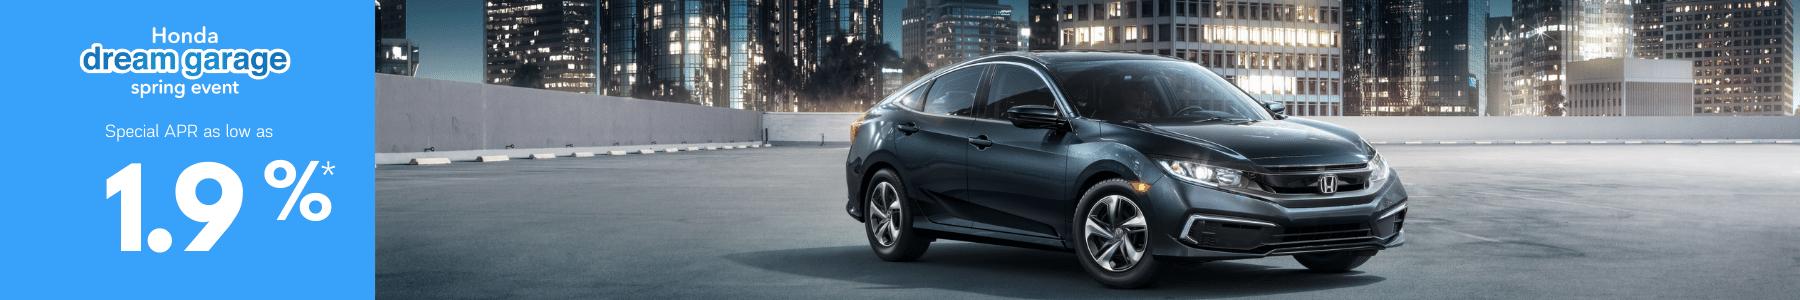 Honda Civic Special apr